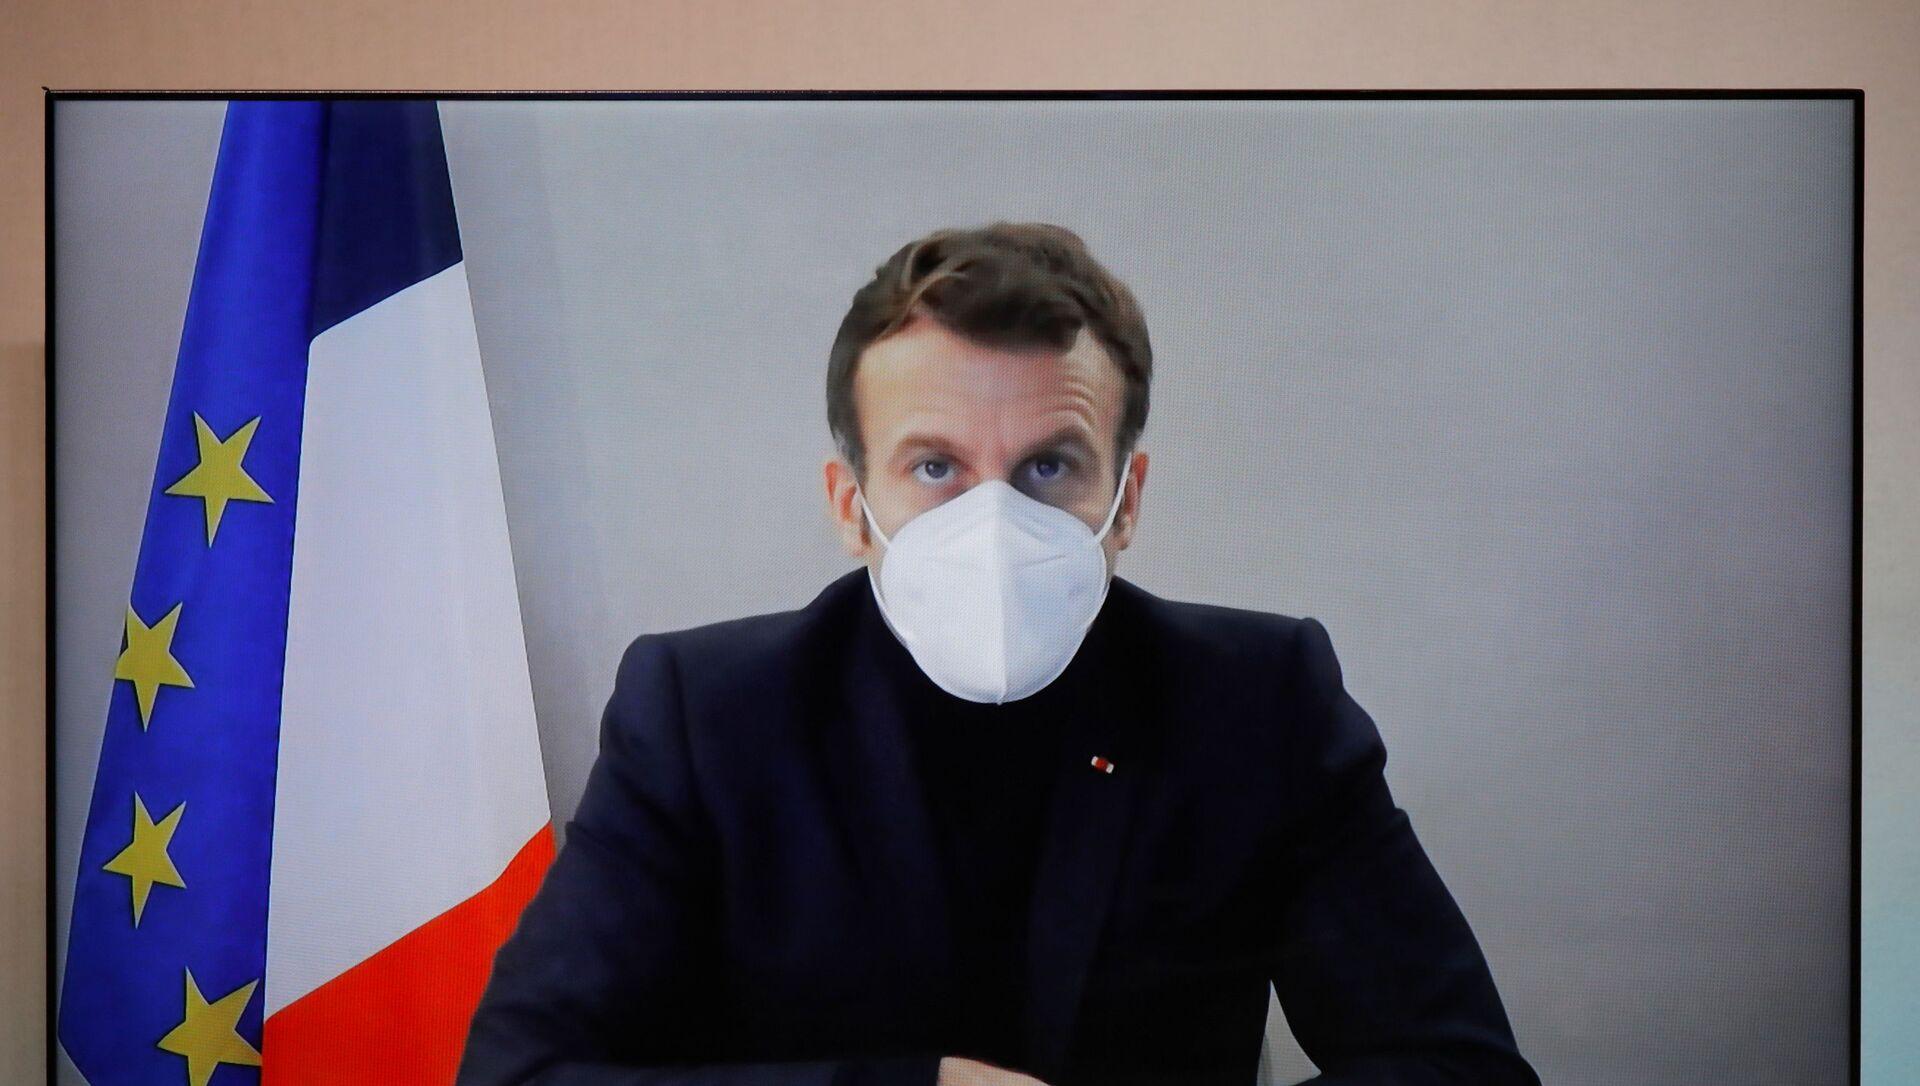 Emmanuel Macron, el presidente de Francia - Sputnik Mundo, 1920, 28.12.2020